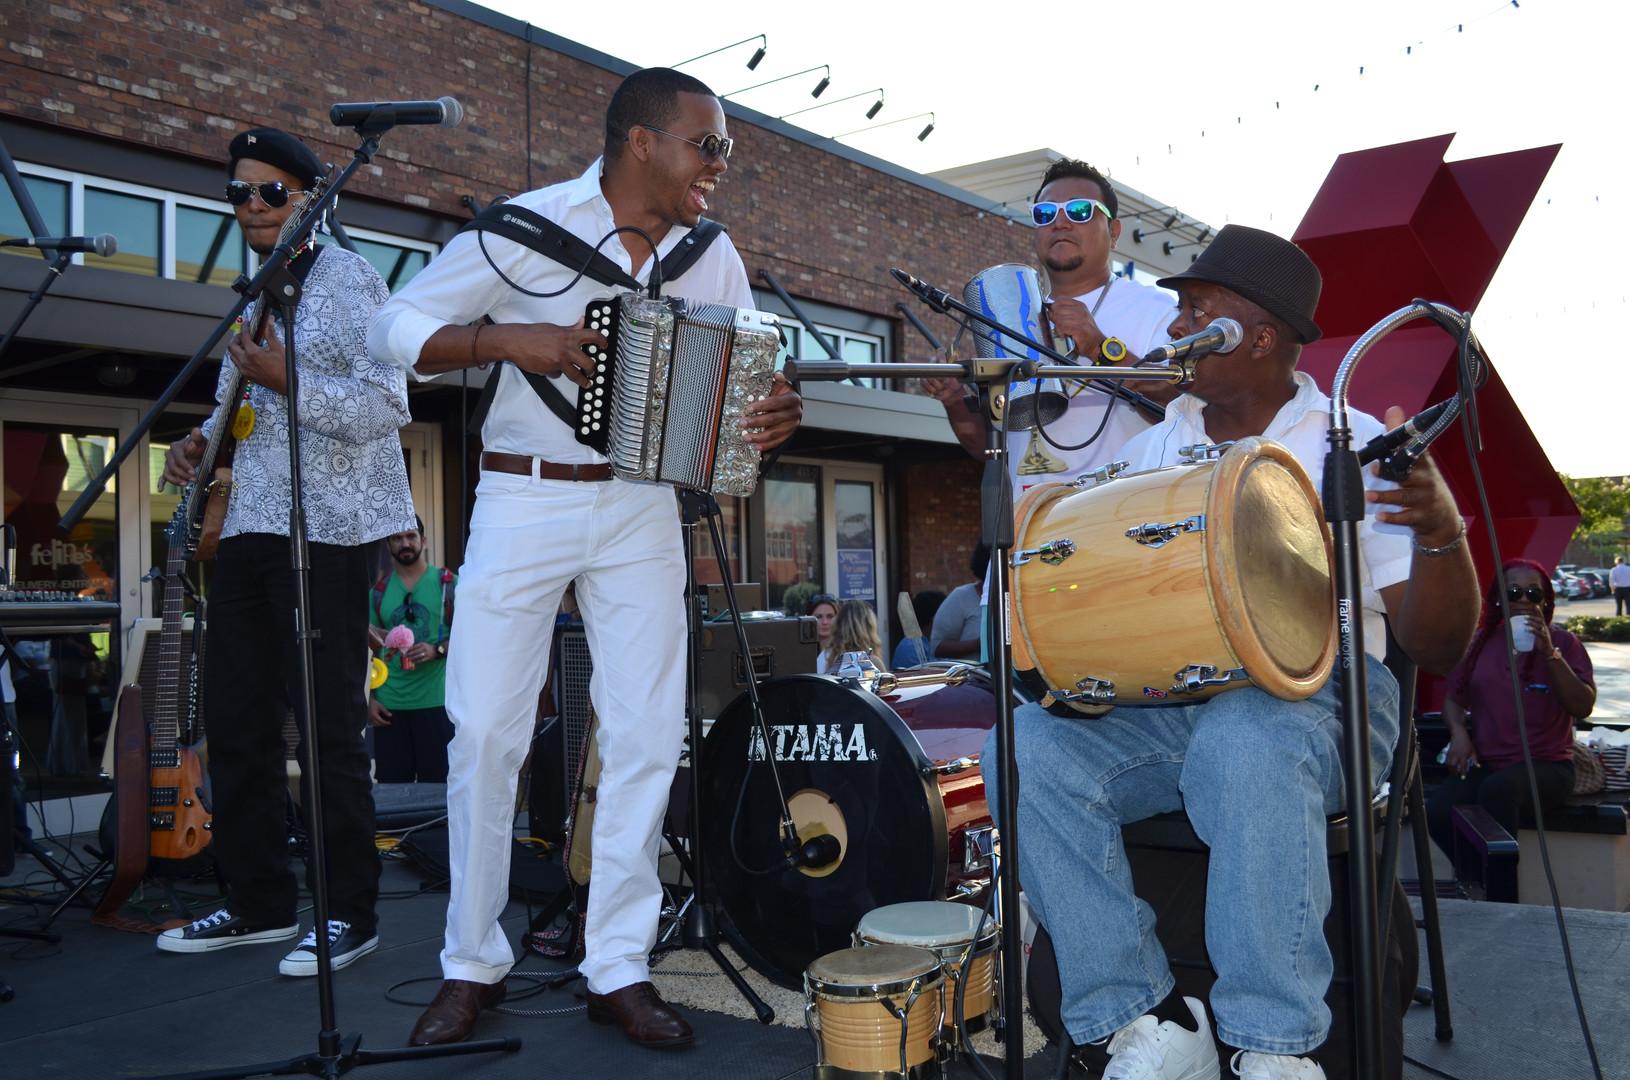 Felipe's Cinco de Mayo Fest 2015